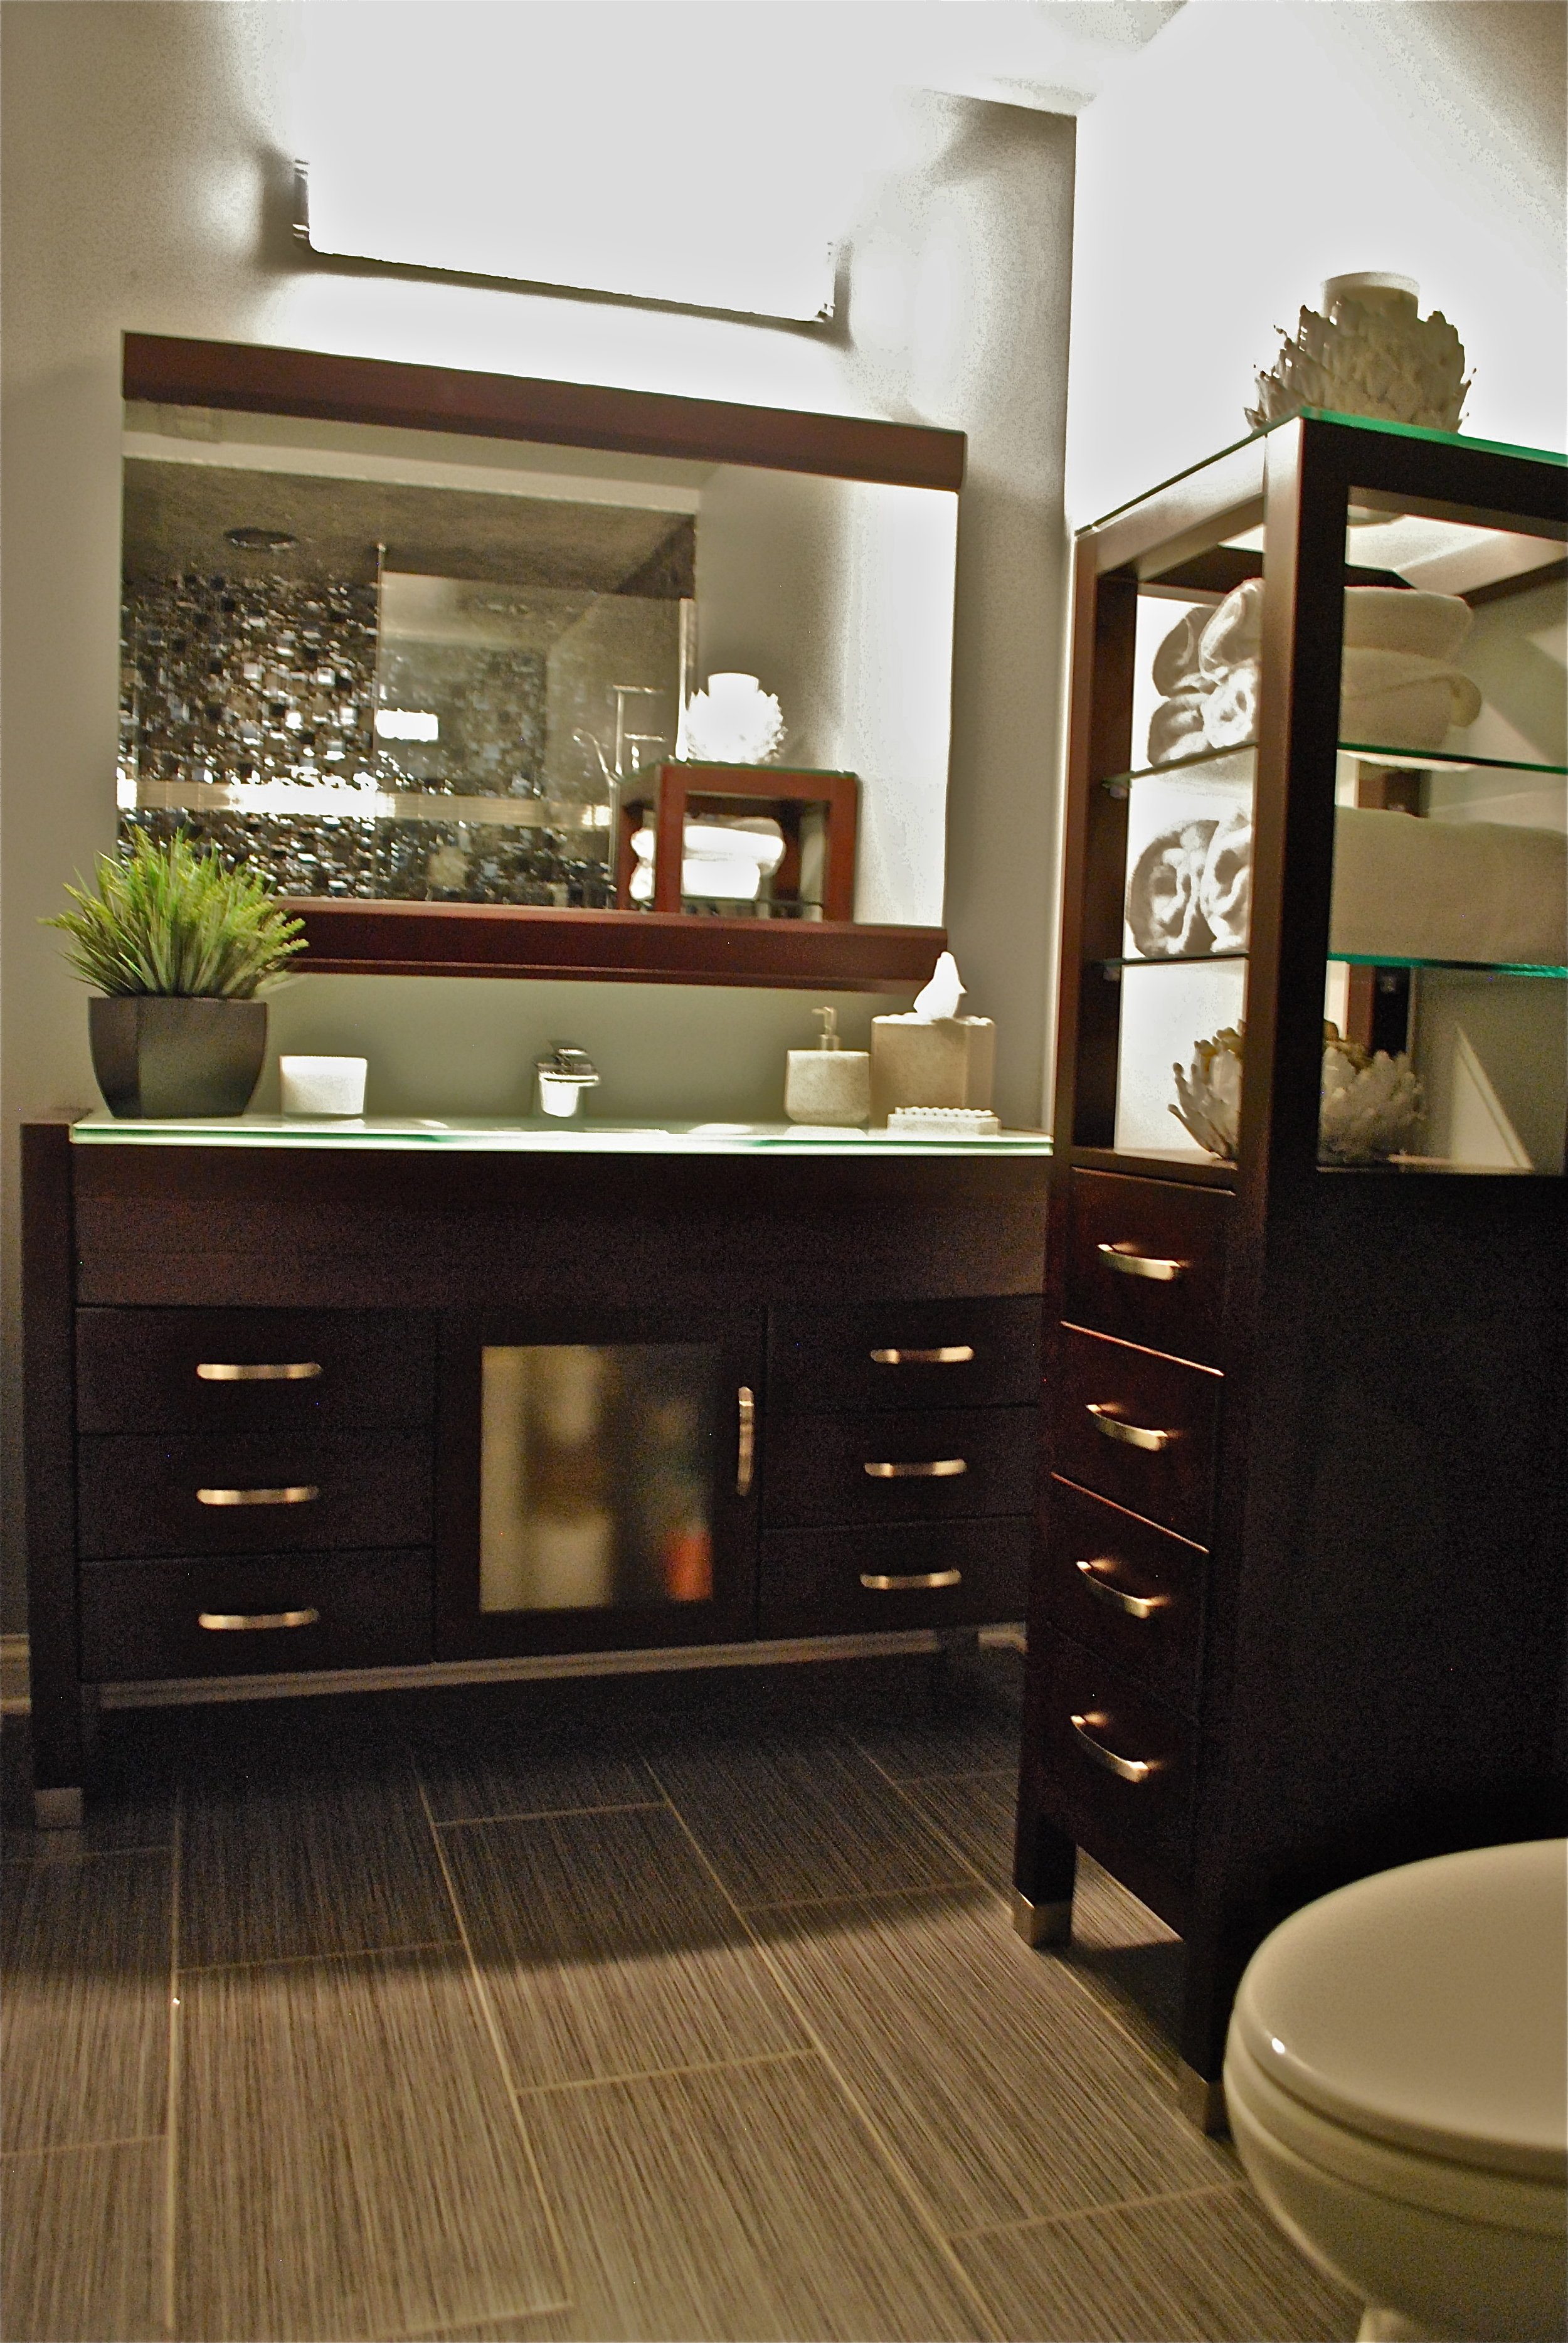 BATH ROOM & BEDROOM ADDITION IN SAINT CHARLES IL